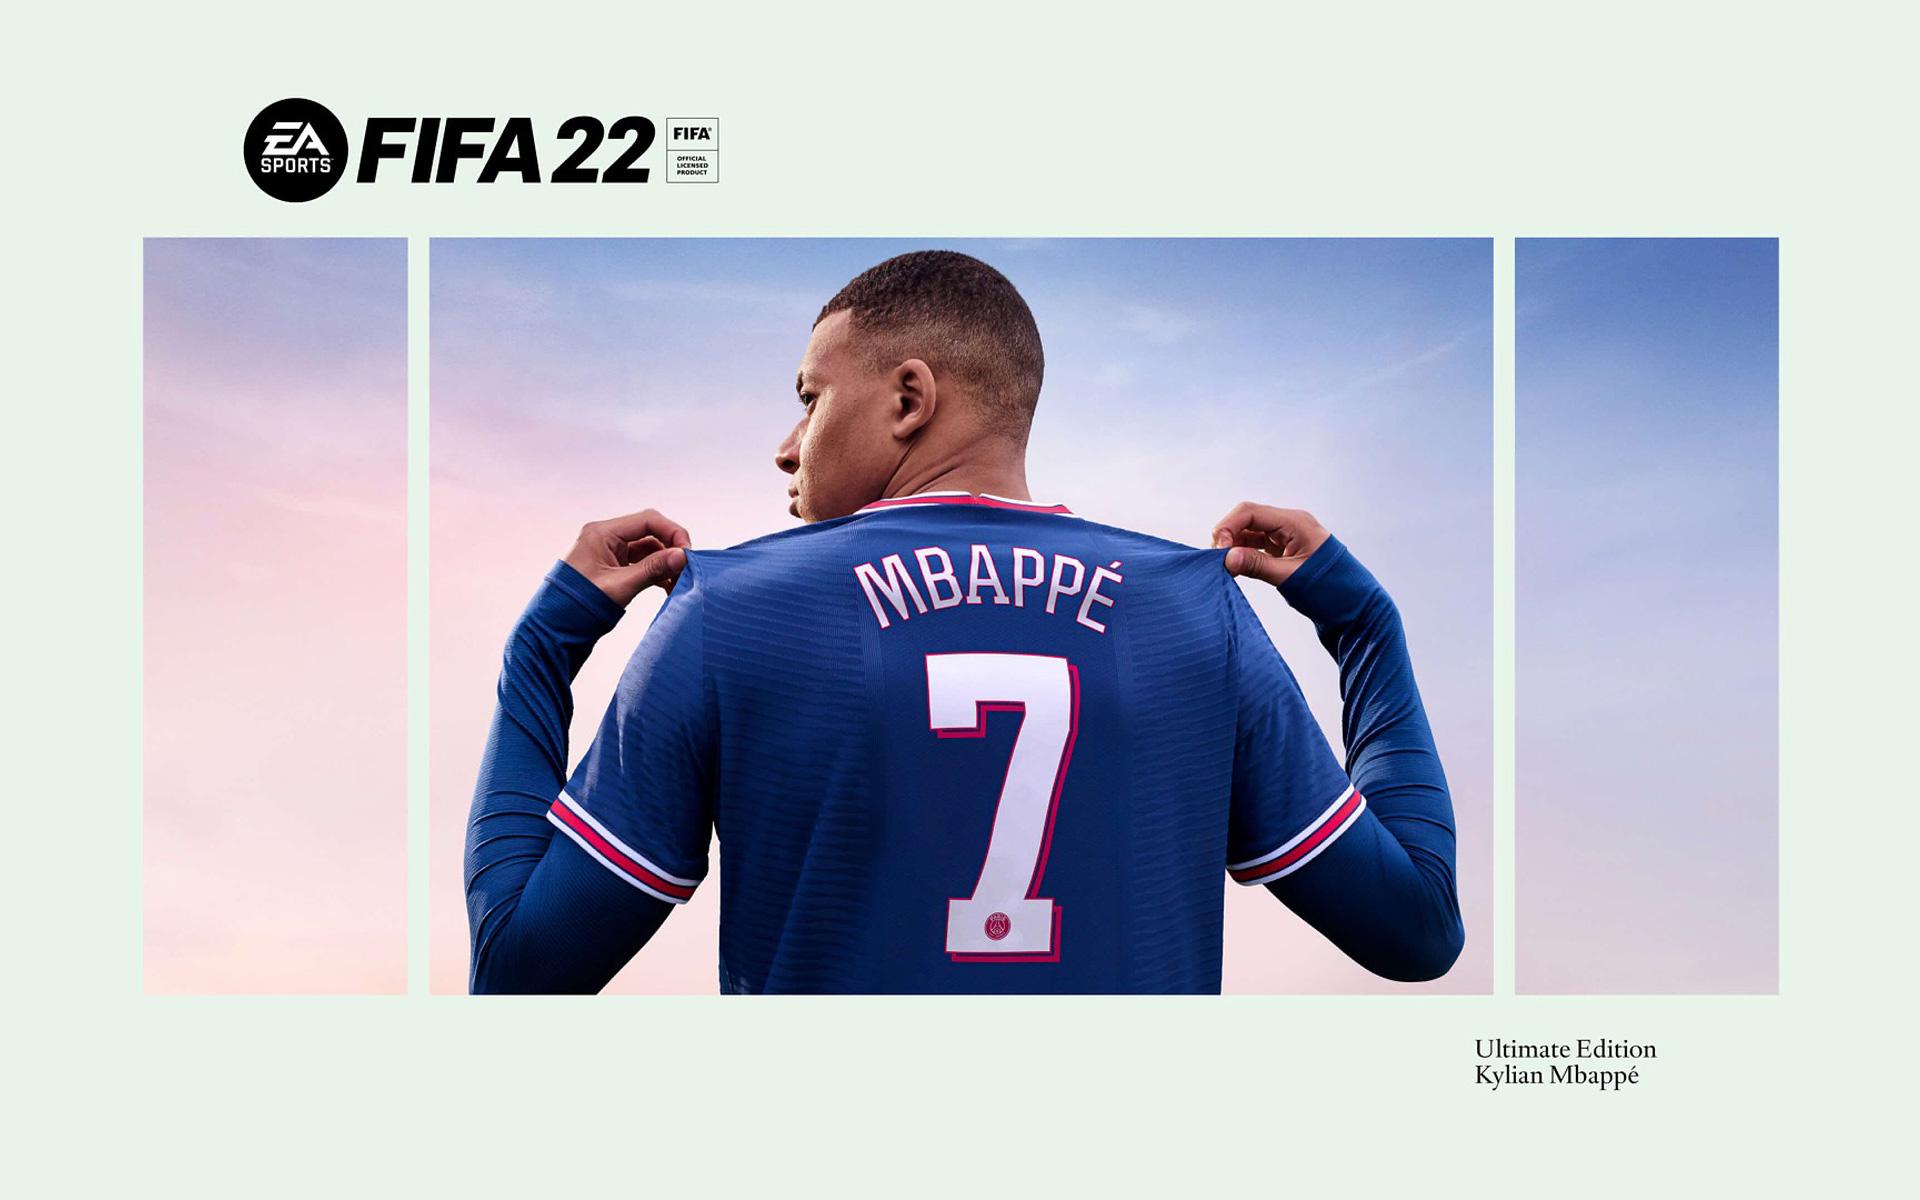 Free FIFA 22 Wallpaper in 1920x1200